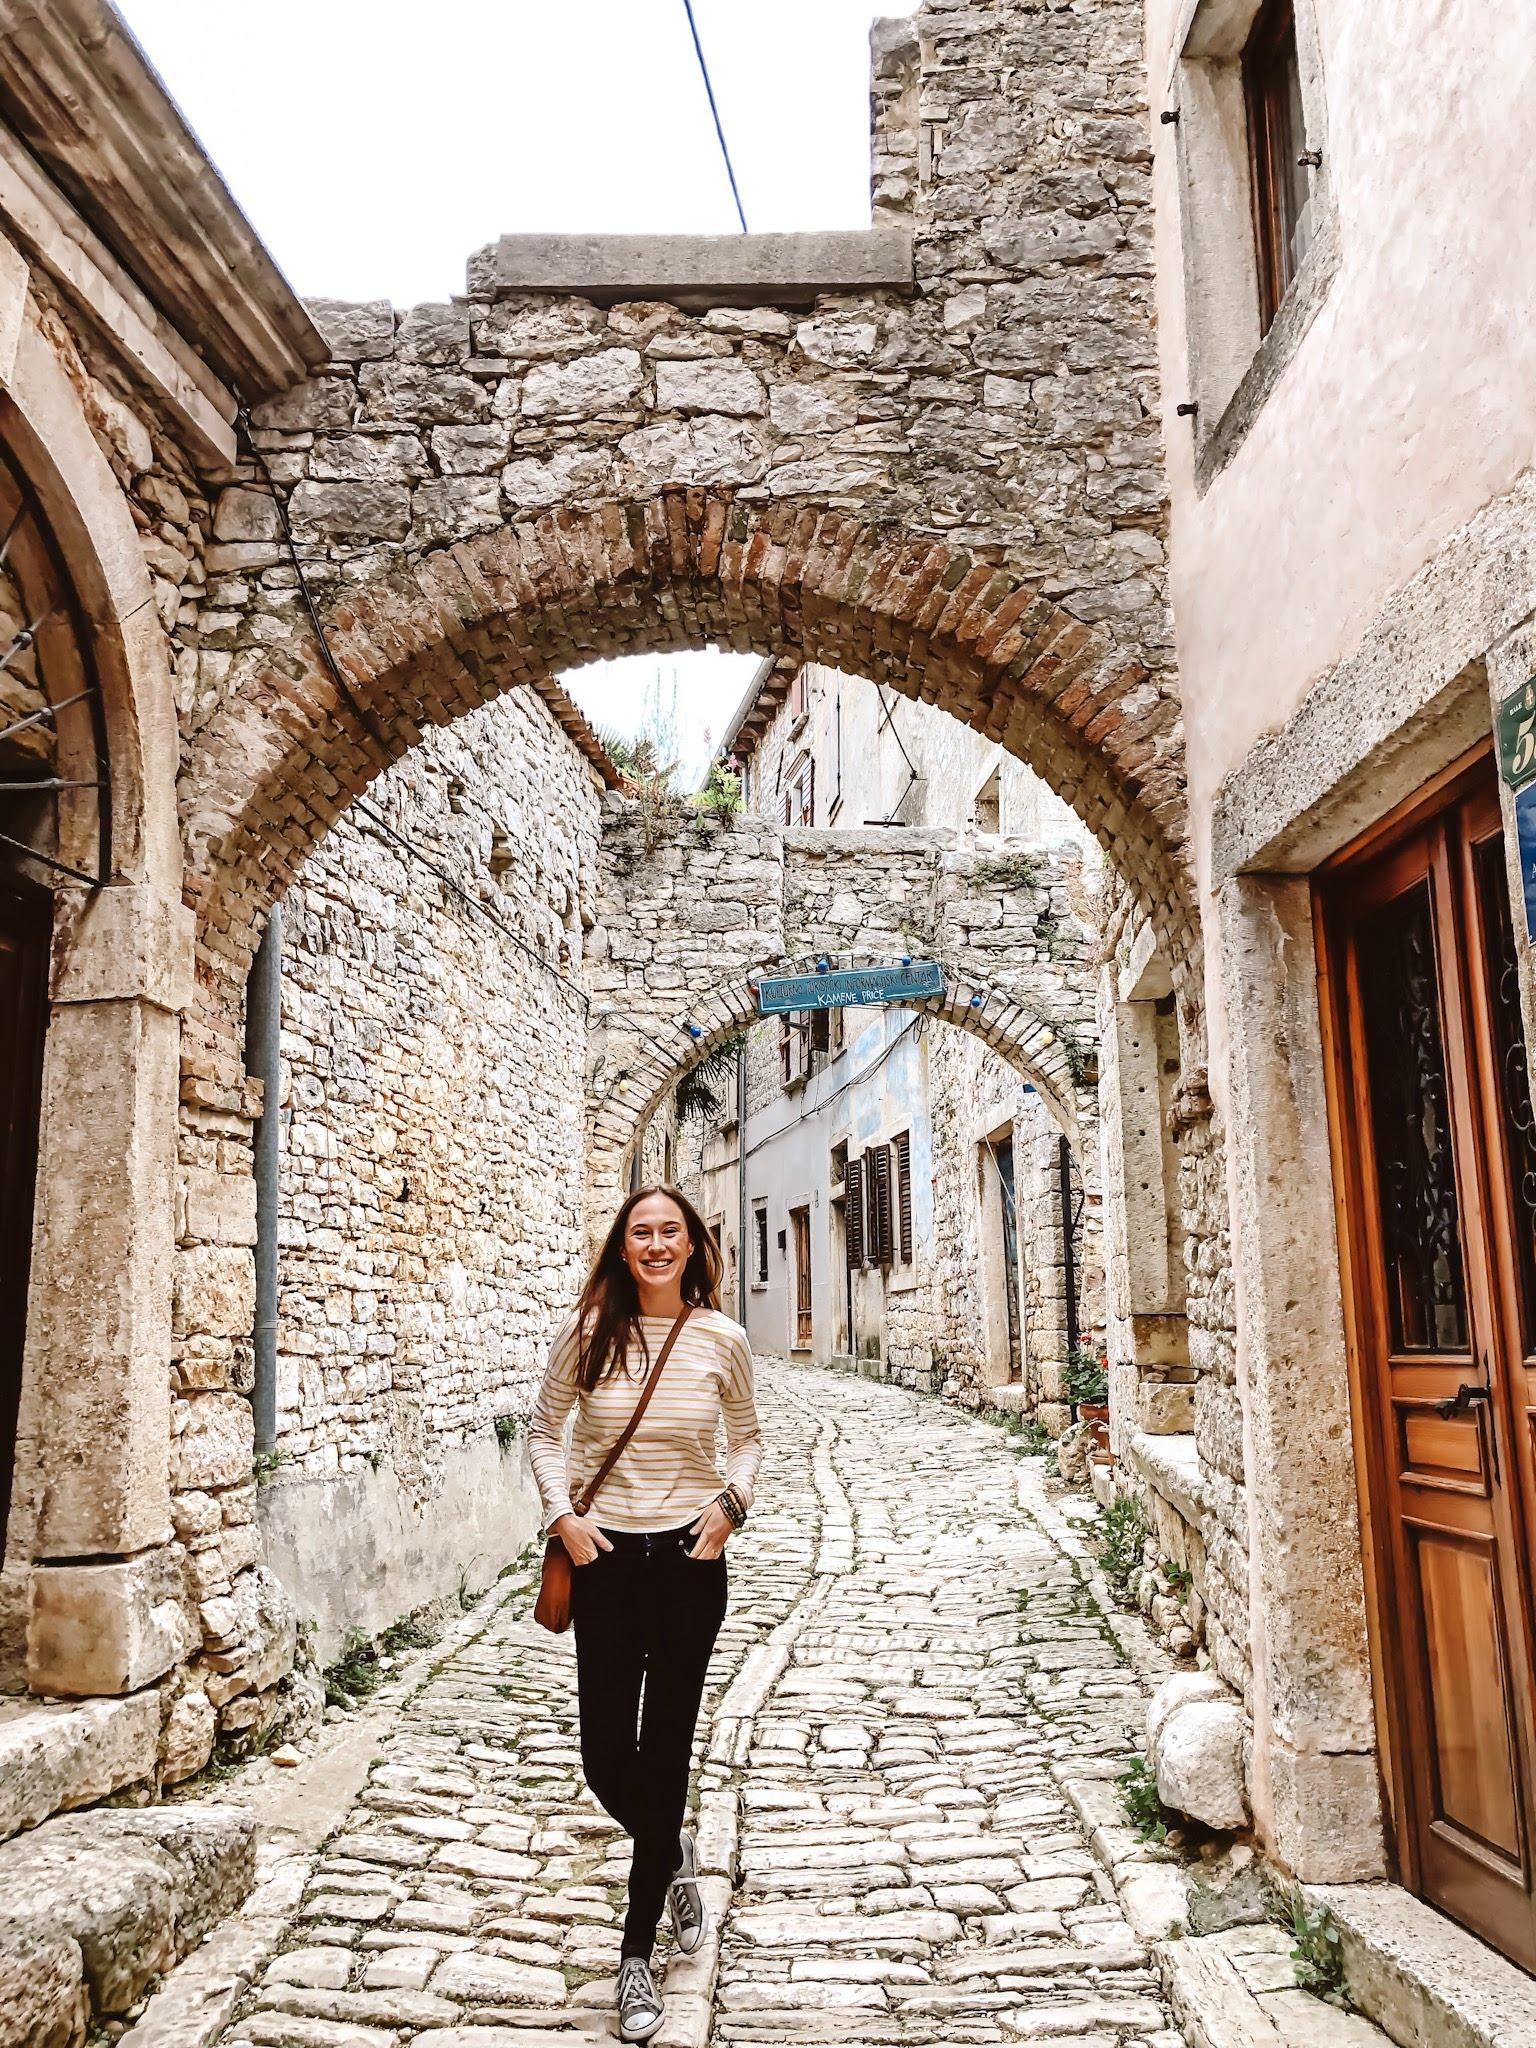 Street in Bale, Istria, Croatia